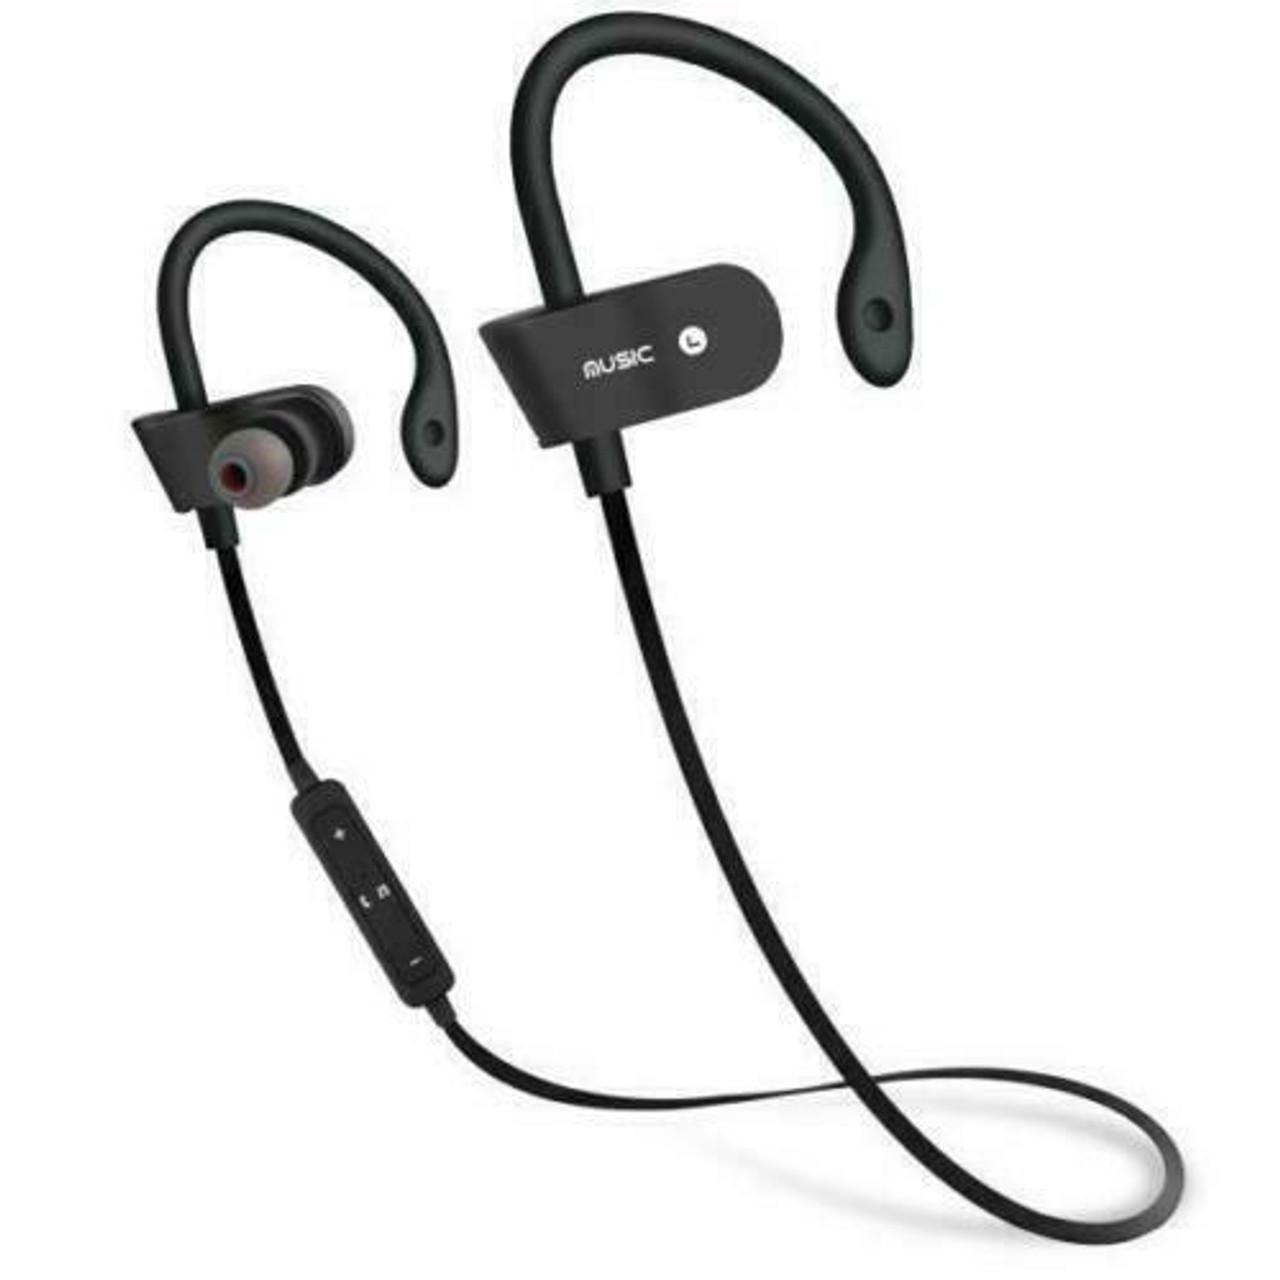 Sweatproof Bluetooth Headset Wireless Sport Stereo Headphones Earphone Earbuds